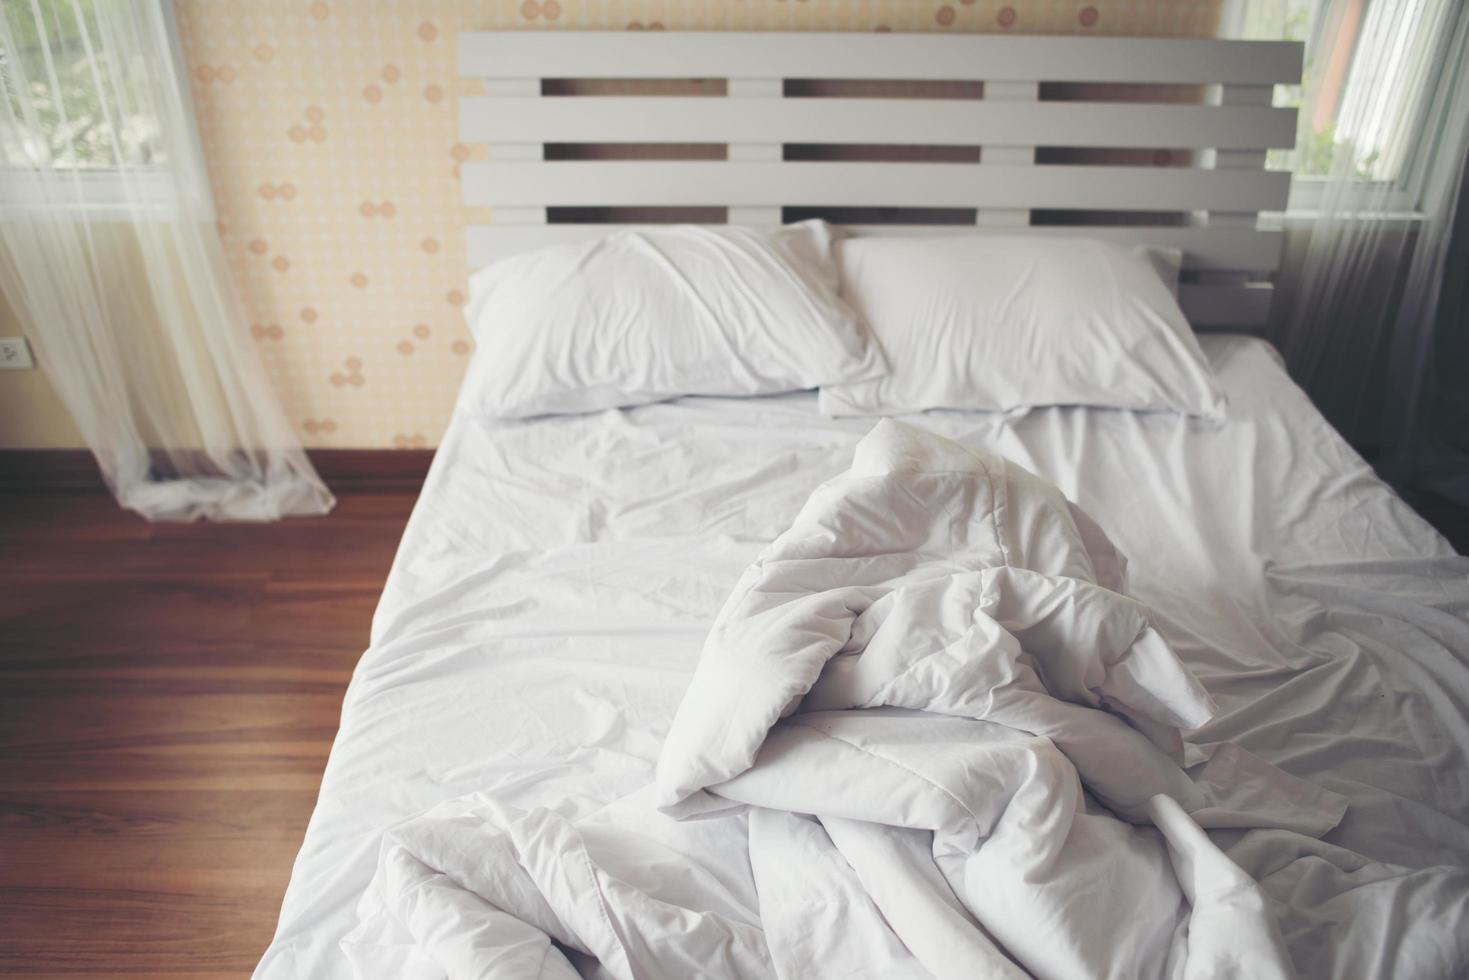 skrynkliga lakan i sovrummet foto